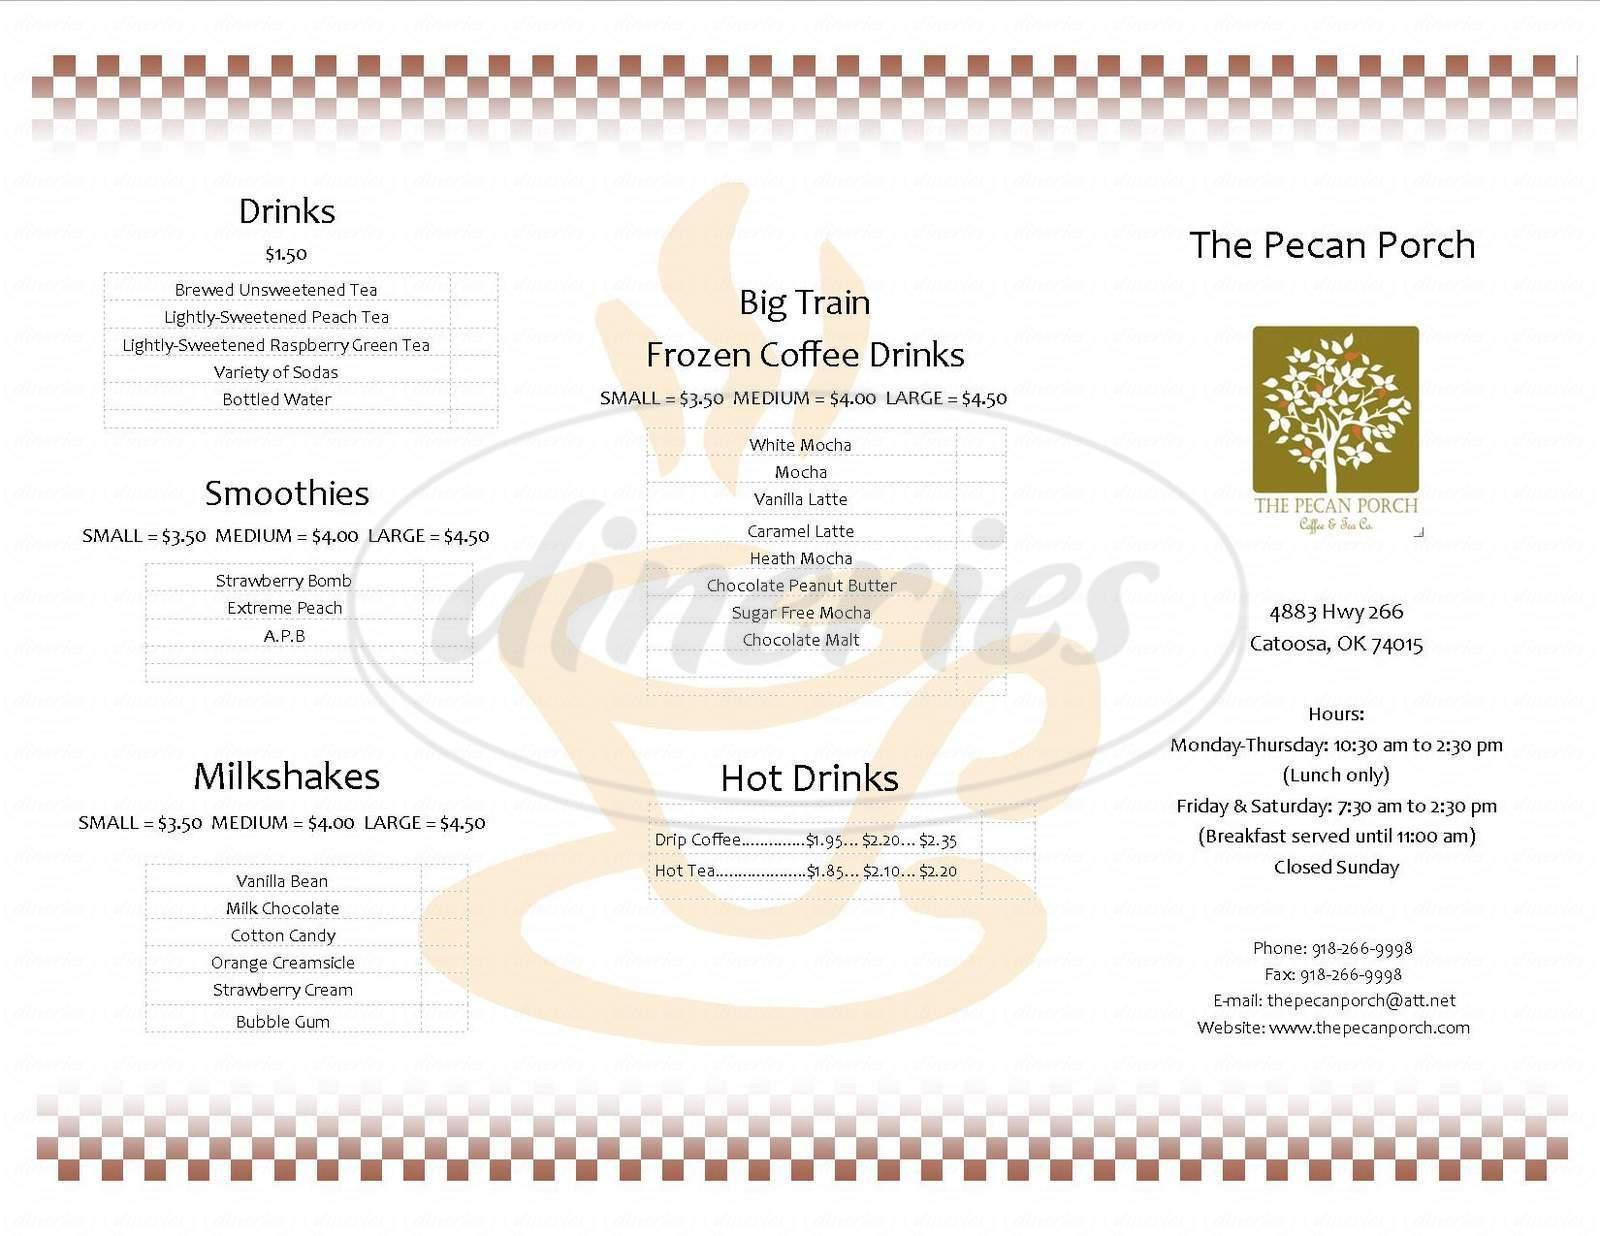 menu for The Pecan Porch